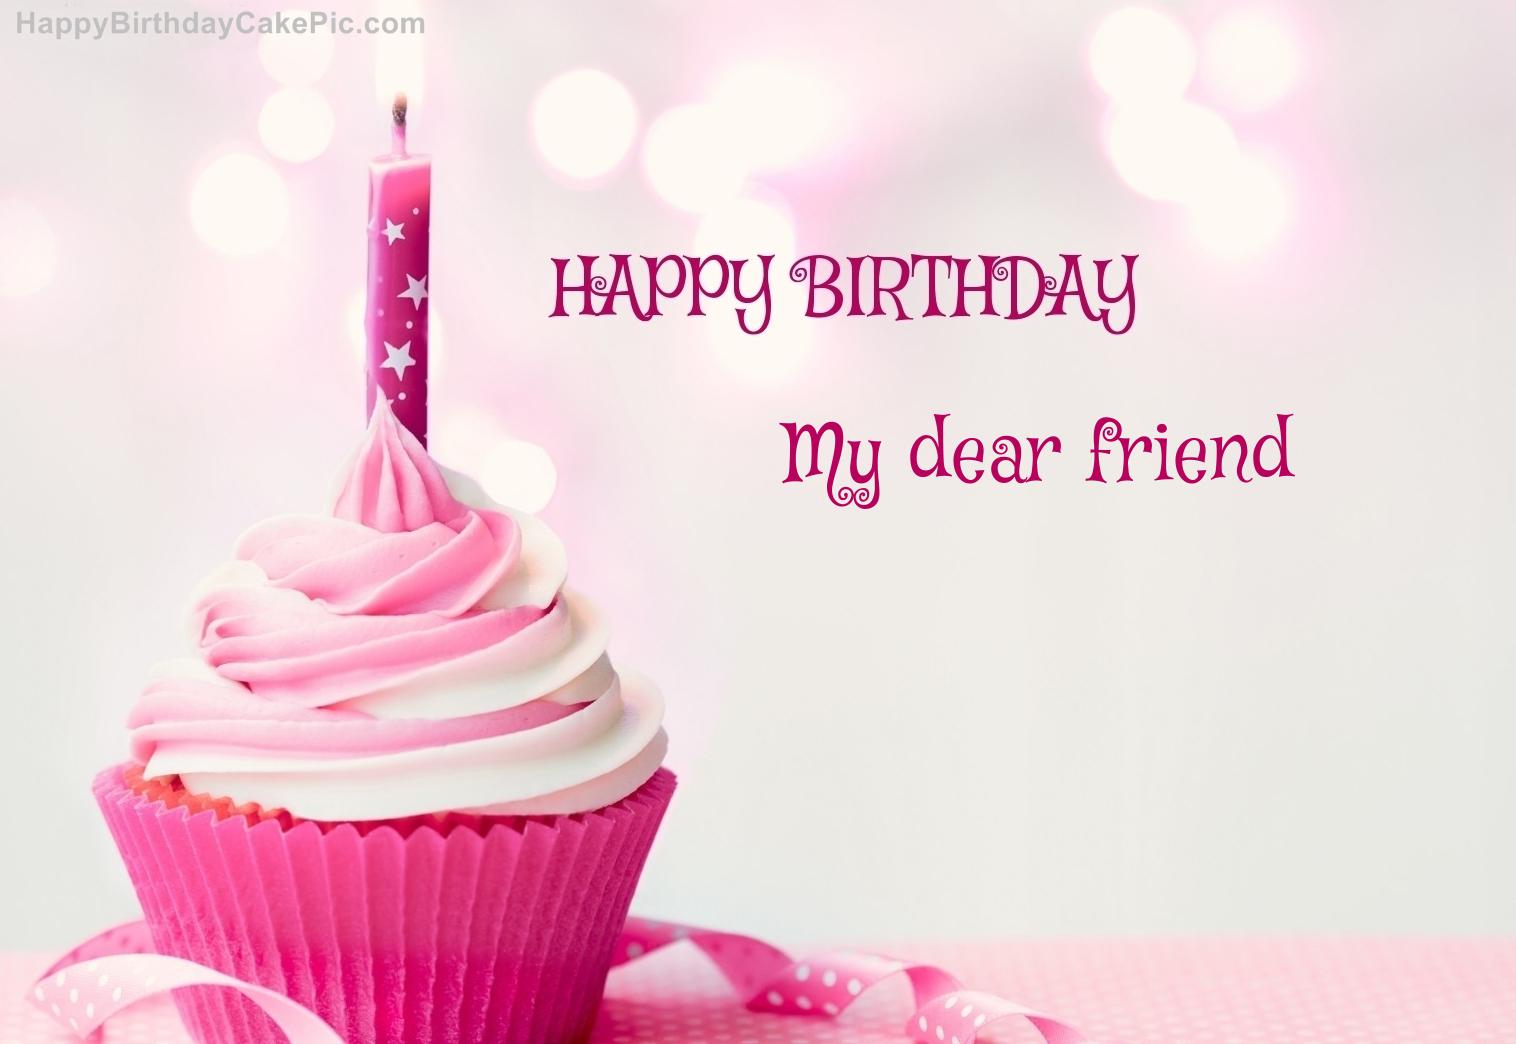 My Name Pix Birthday Cake For Friend